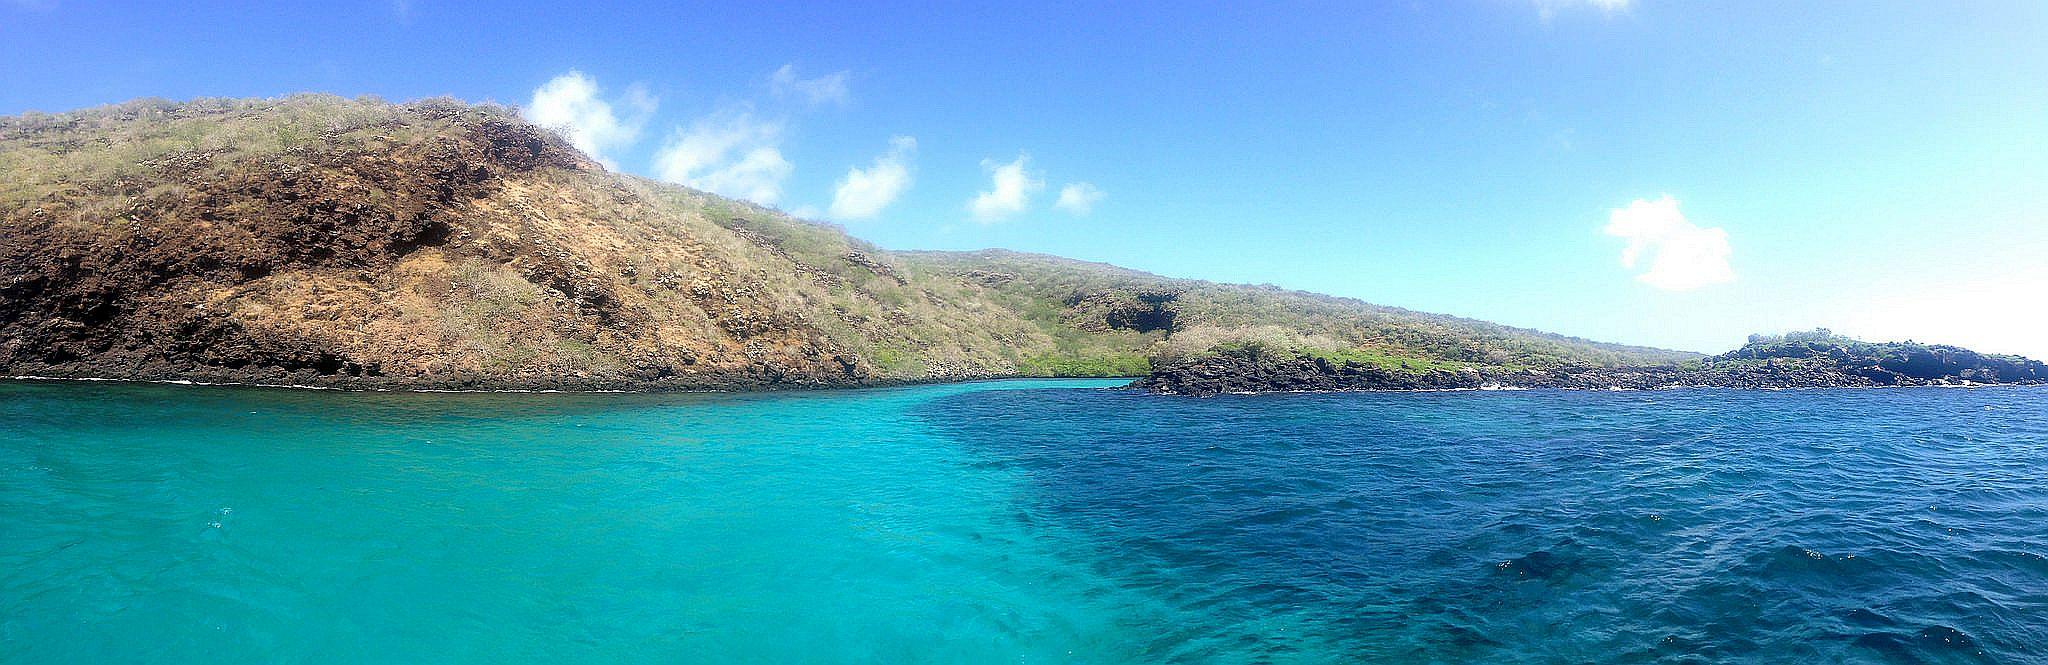 Galapagos Singles Travel Tours Galapagos Vacations Packages - Galapagos vacations